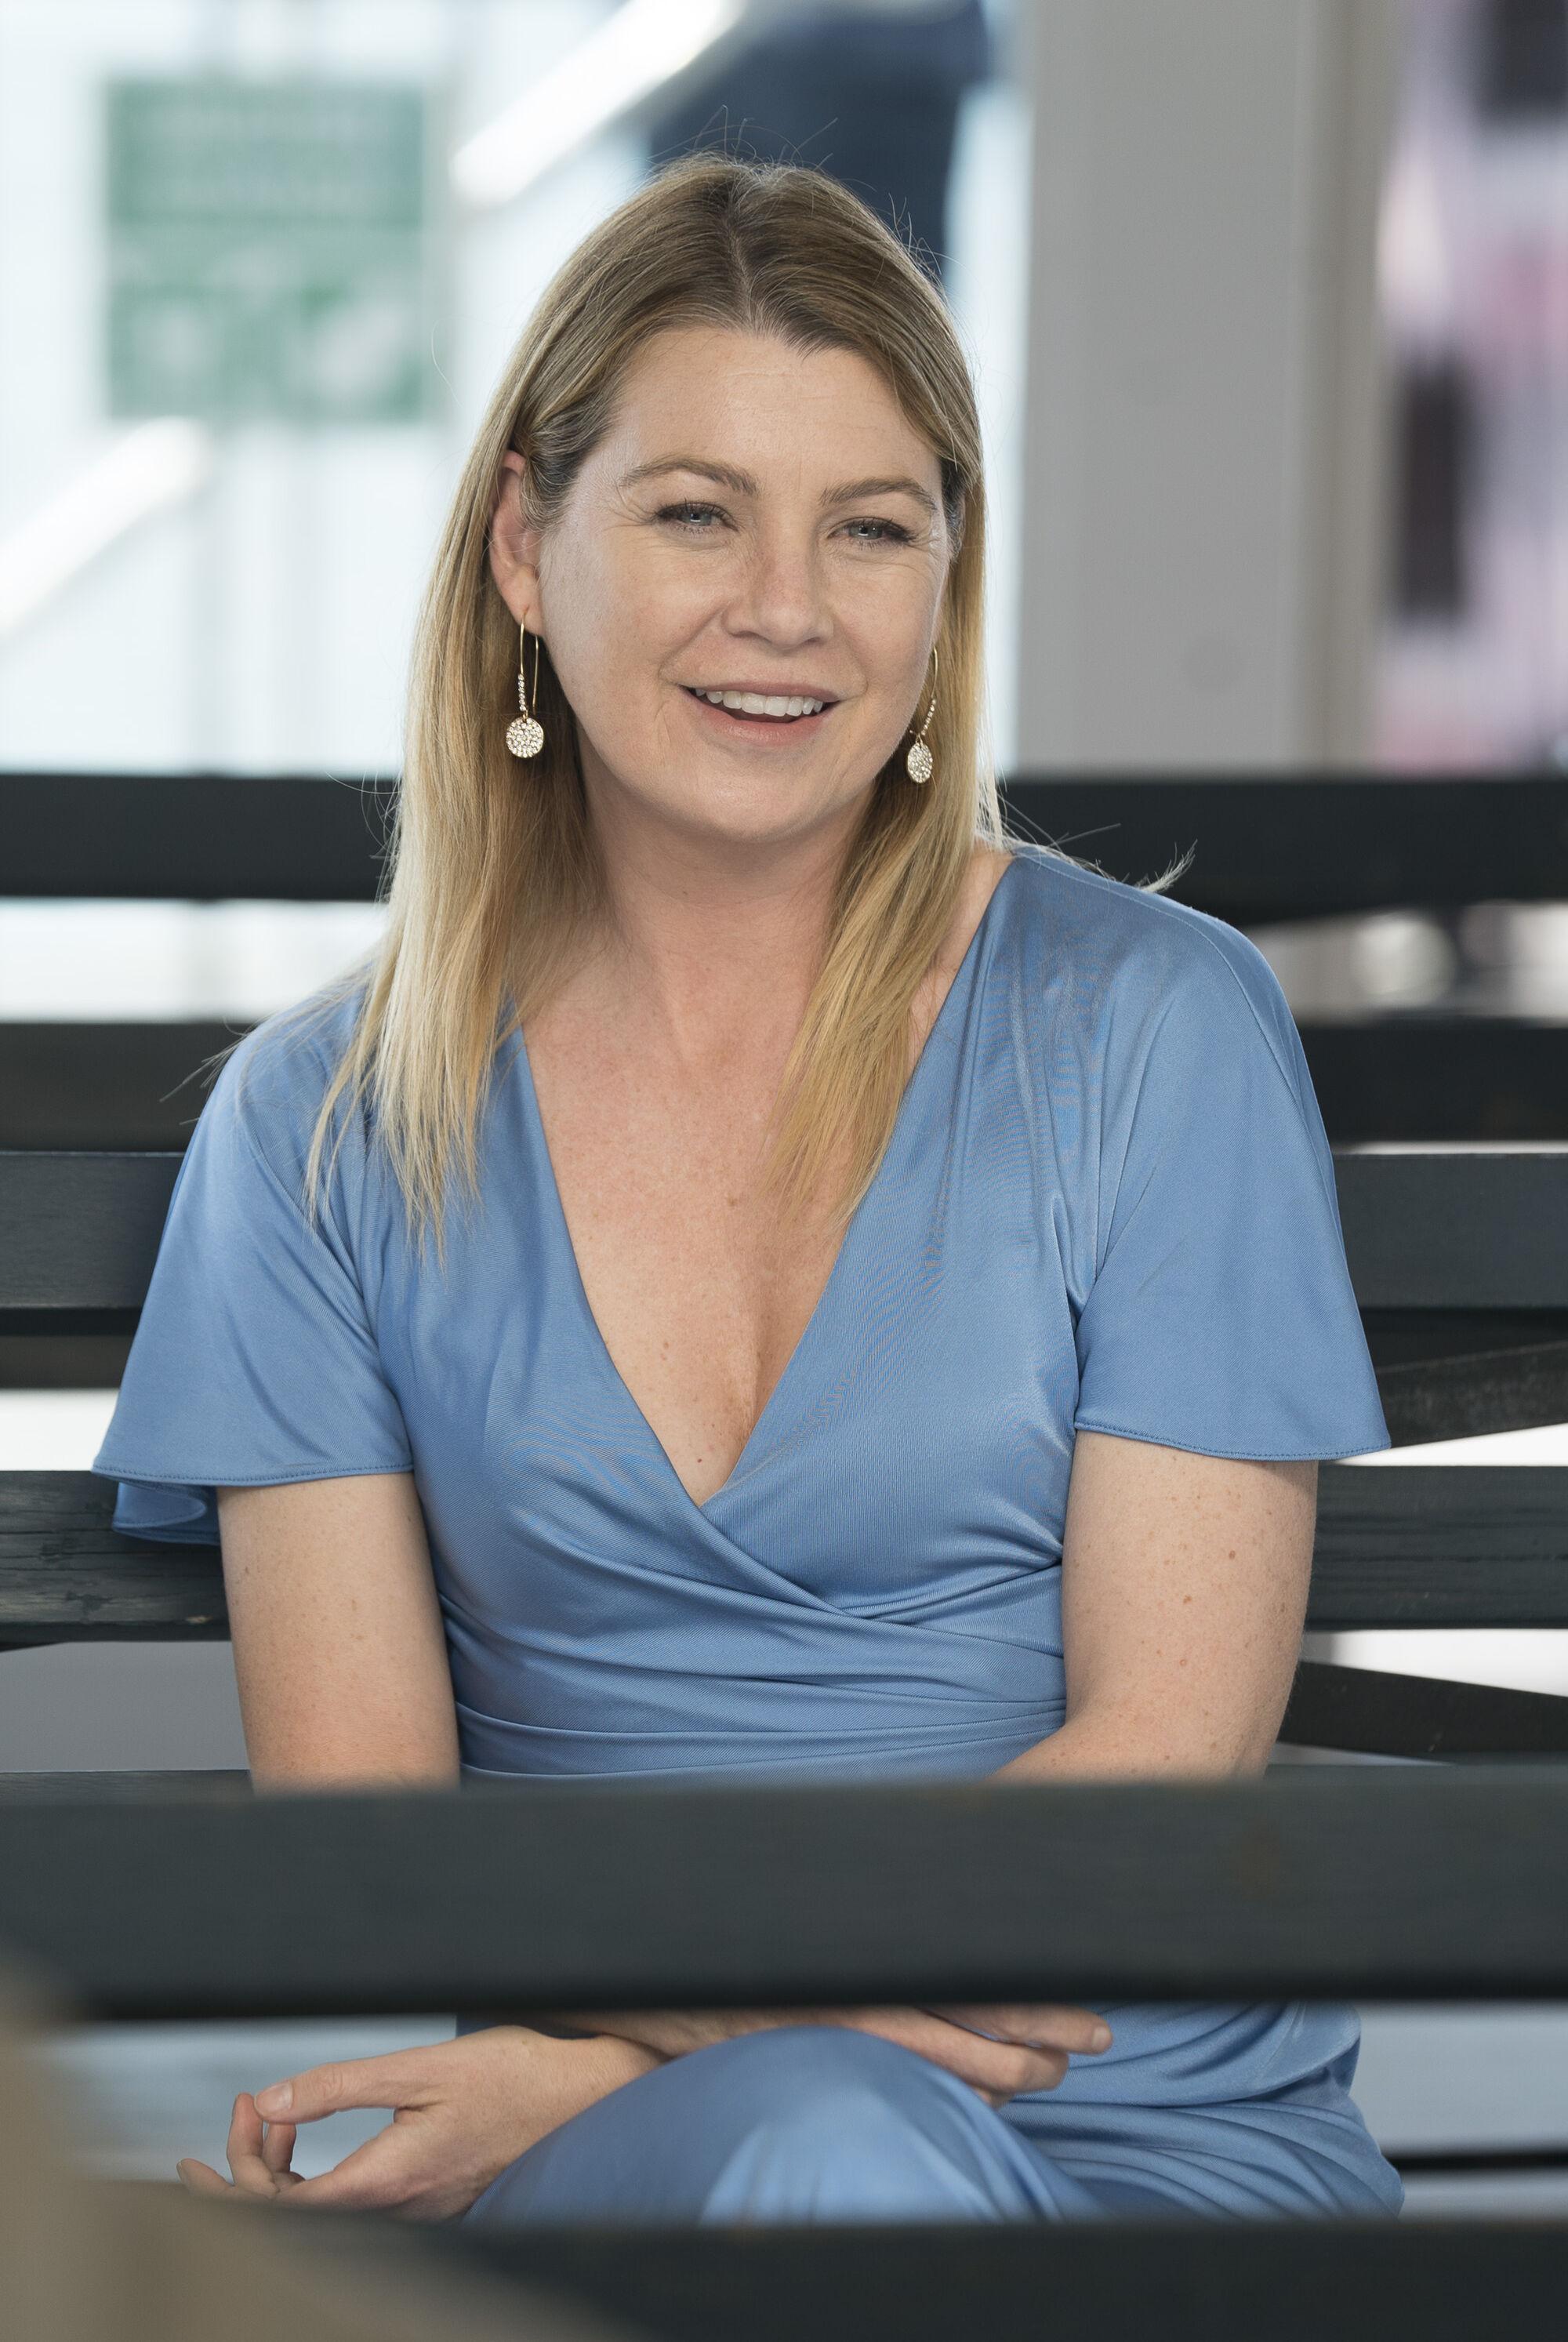 Meredith Grey | Grey's Anatomy Universe Wiki | FANDOM ...